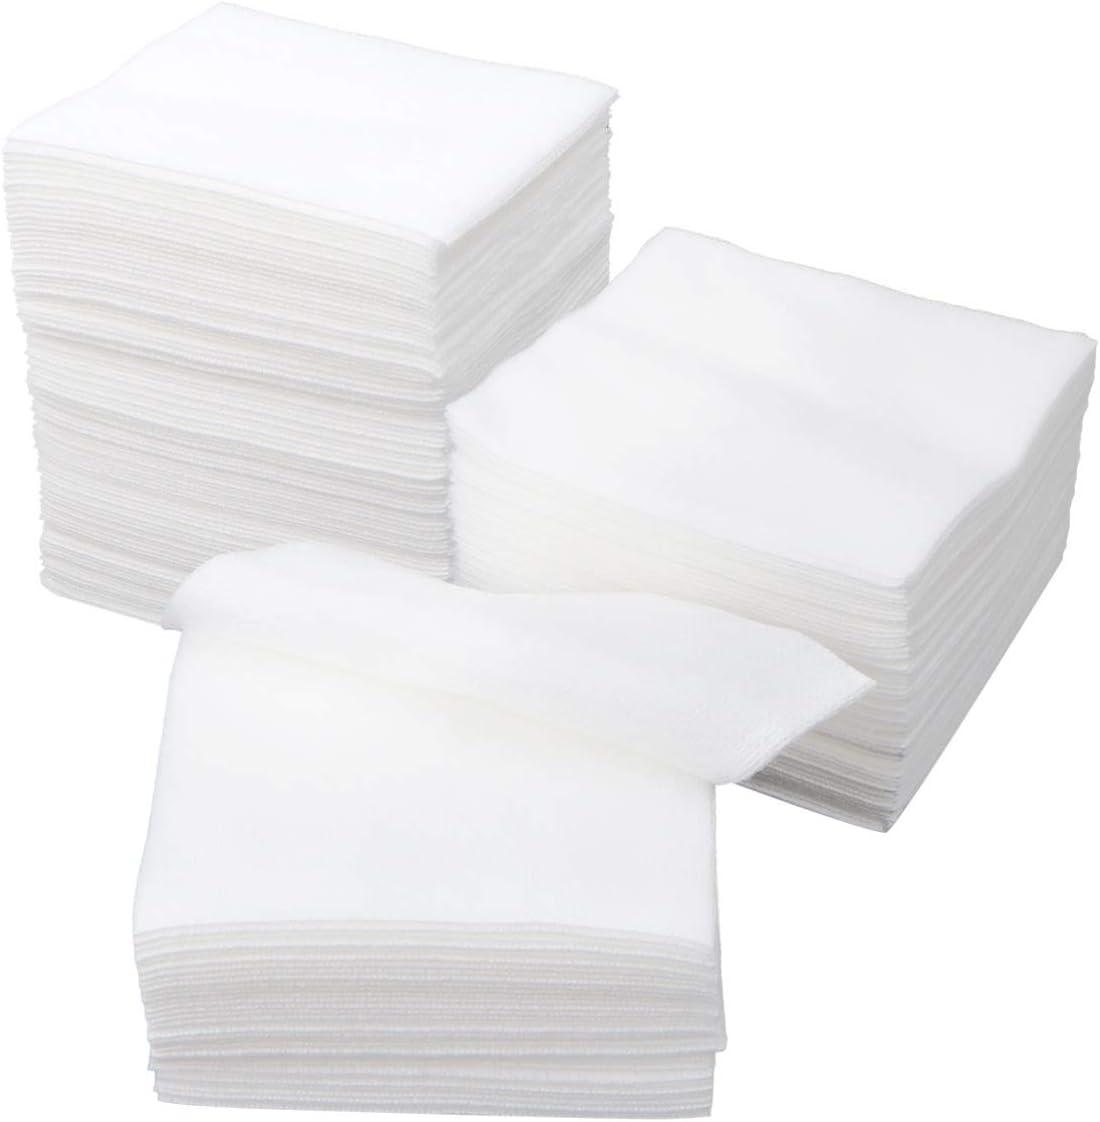 BESTOYARD Non Woven Shipping included Max 40% OFF Gauze Sponge Care Medical Ga Sterile Cushion